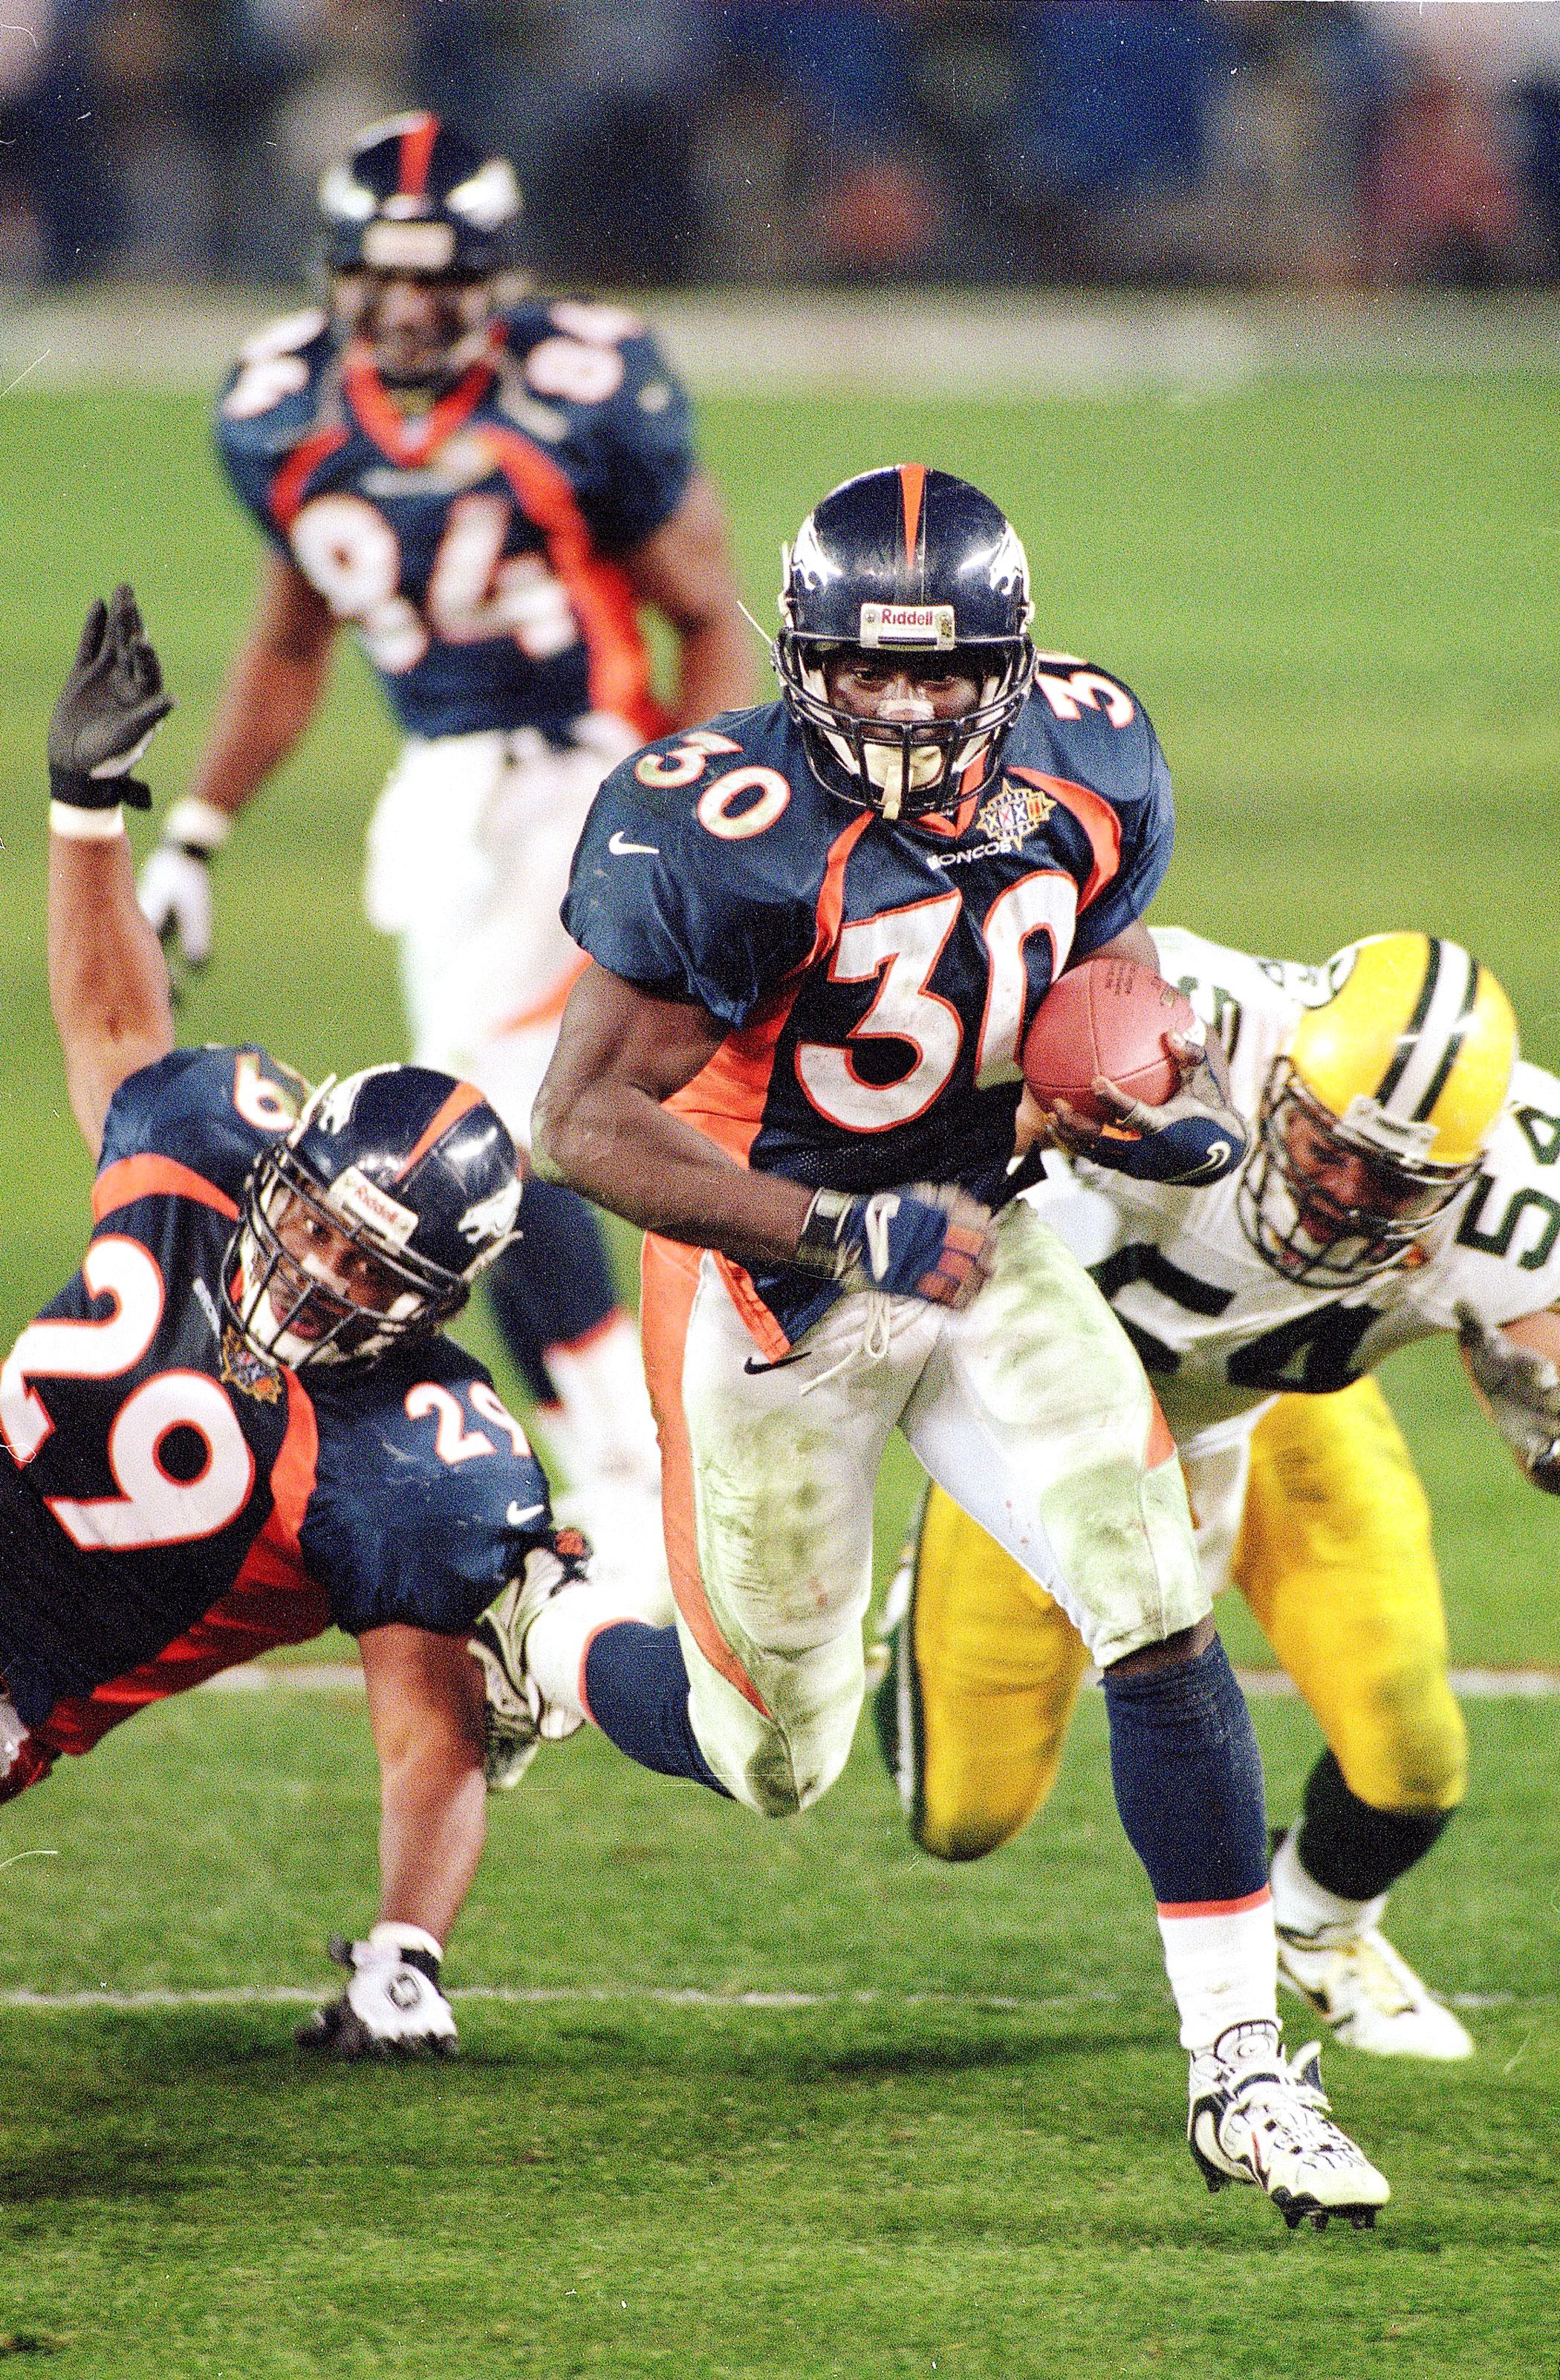 Super Bowl XXXII, Jan. 25, 1998                               Denver Broncos vs Green Bay Packers in San Diego